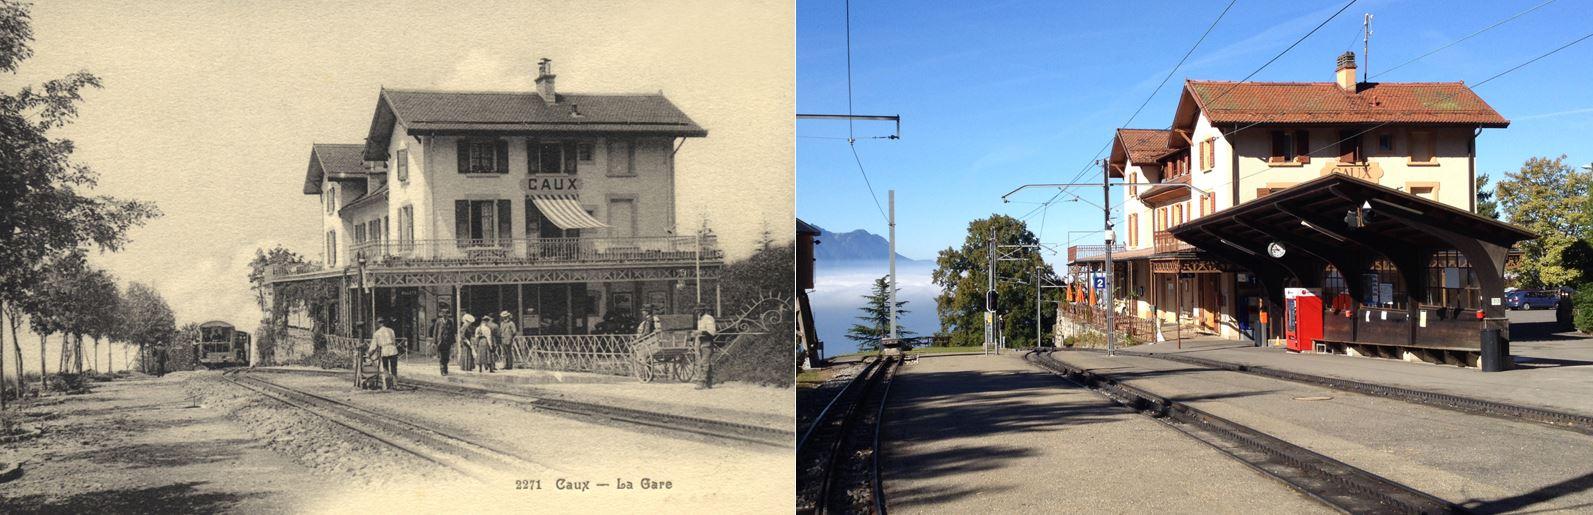 La gare de Caux en 1910 et en 2017